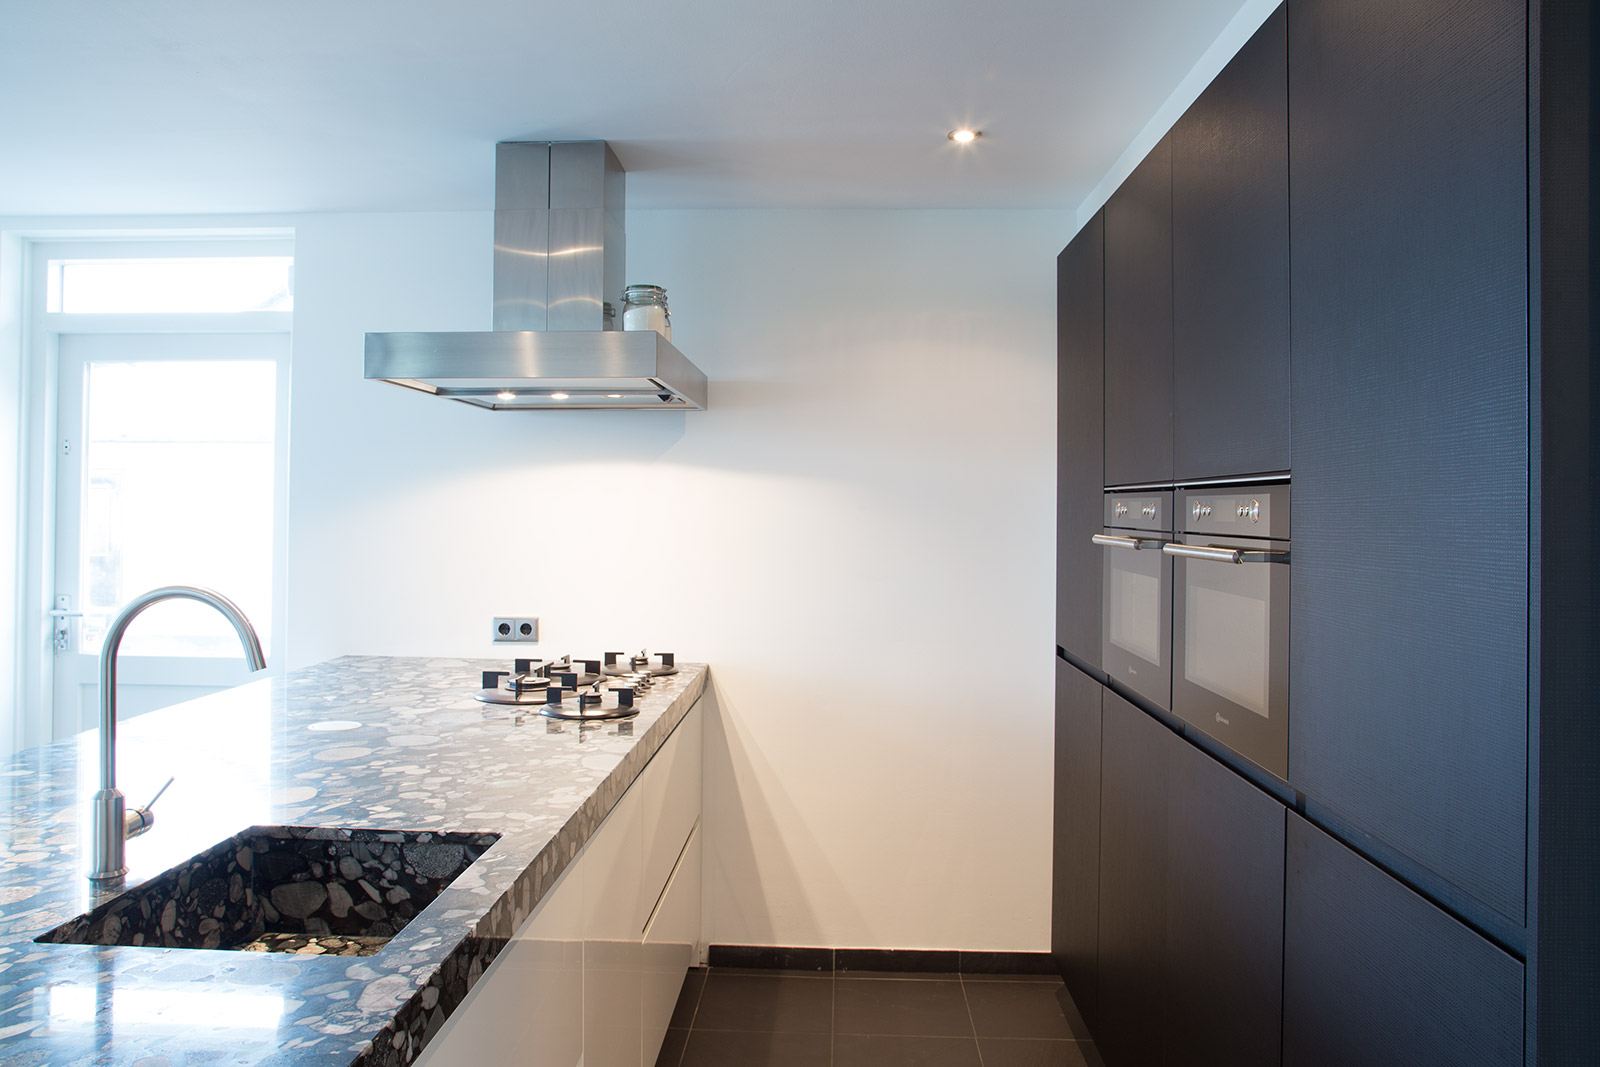 Keuken Kasten Melamine : Hoogglans keuken - CVH Design - Maatinterieur ...